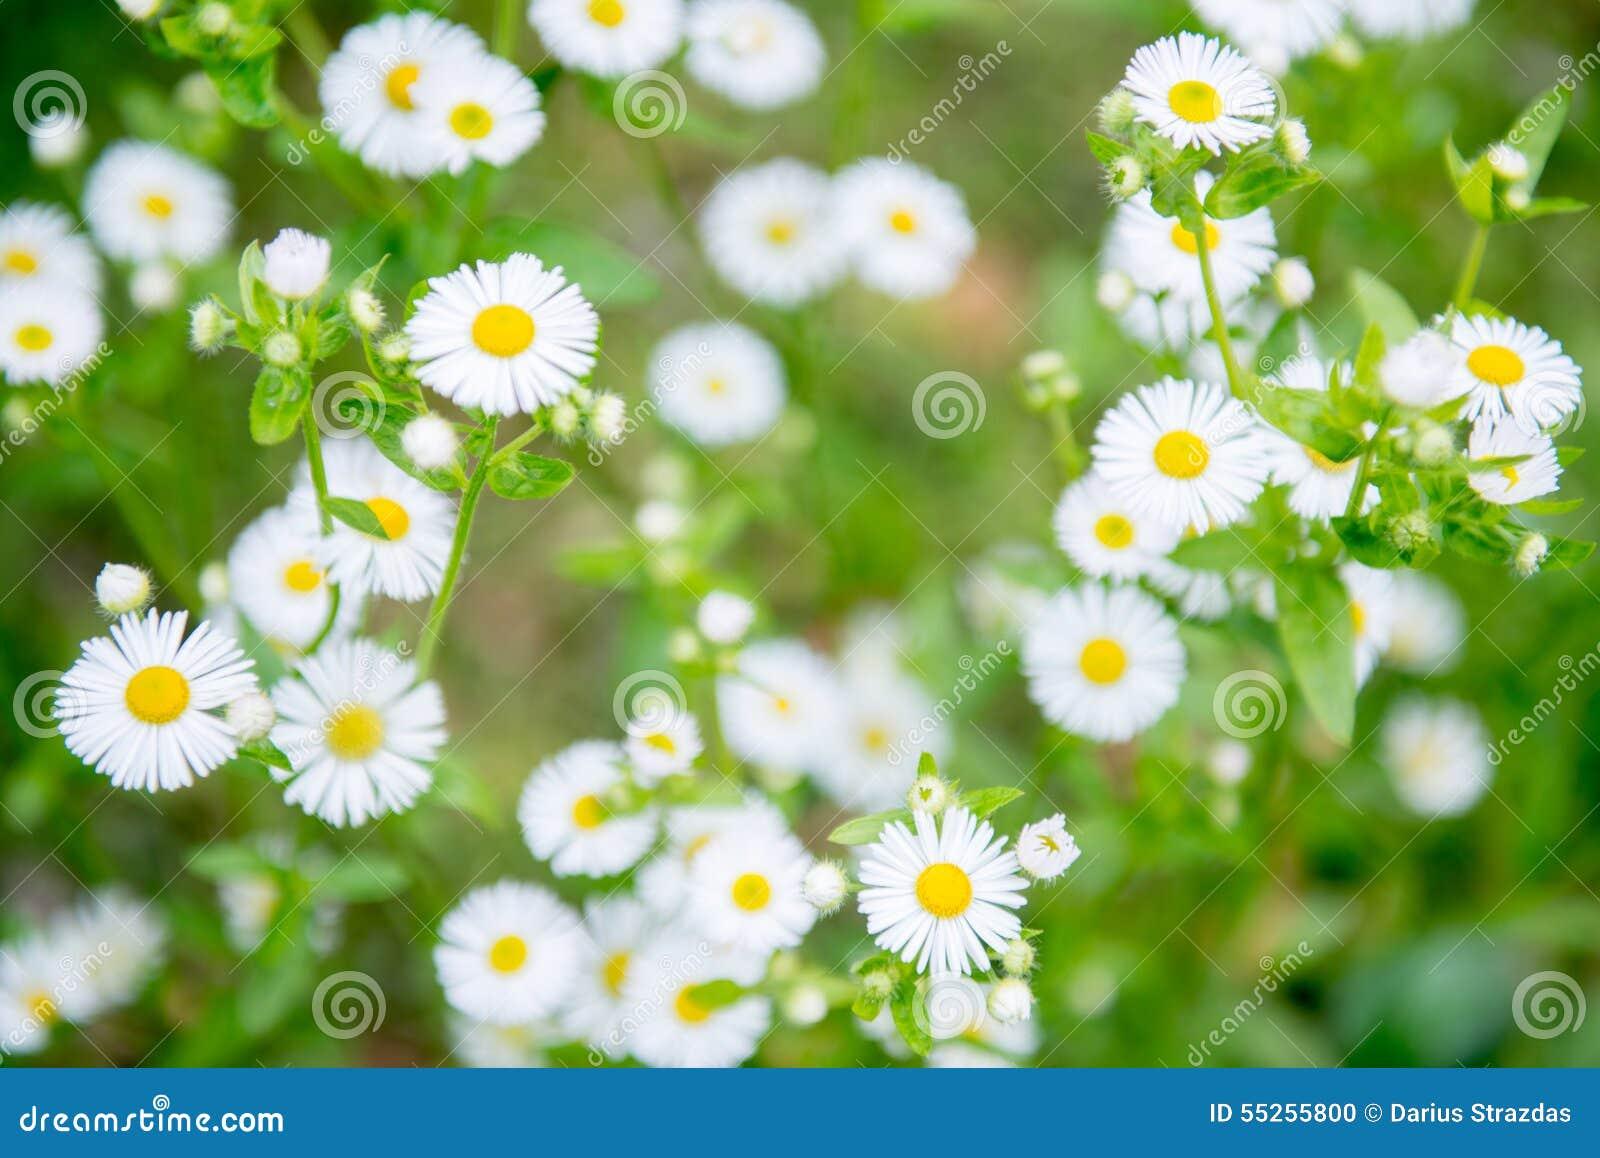 Camomilechamomillaen blommar illustrationmatricariavektorn